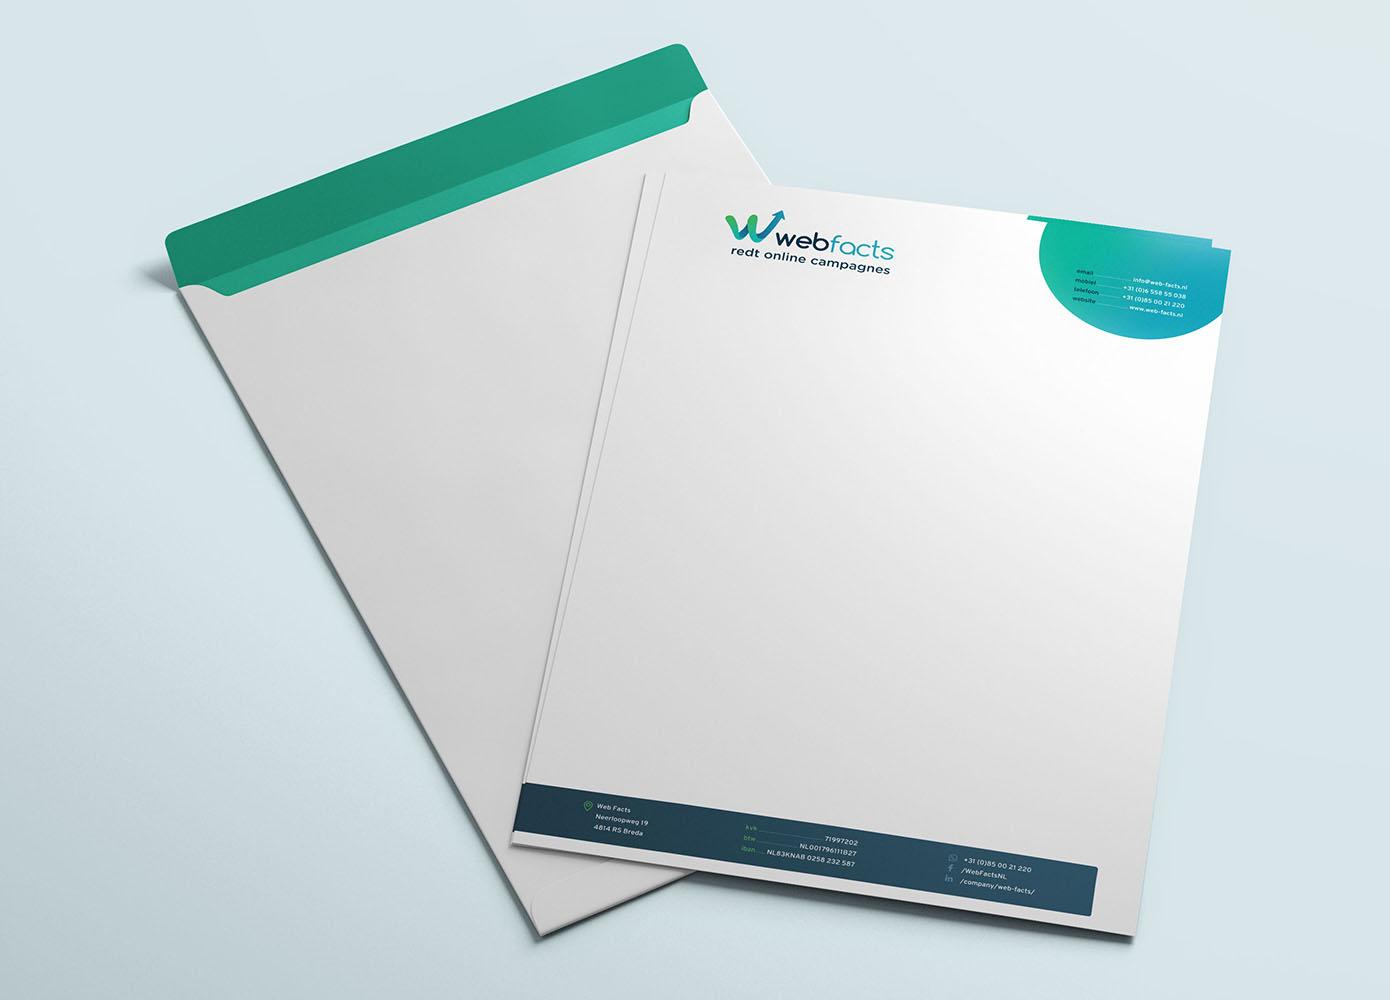 Briefpapier en envelop ontwerp van Webfacts